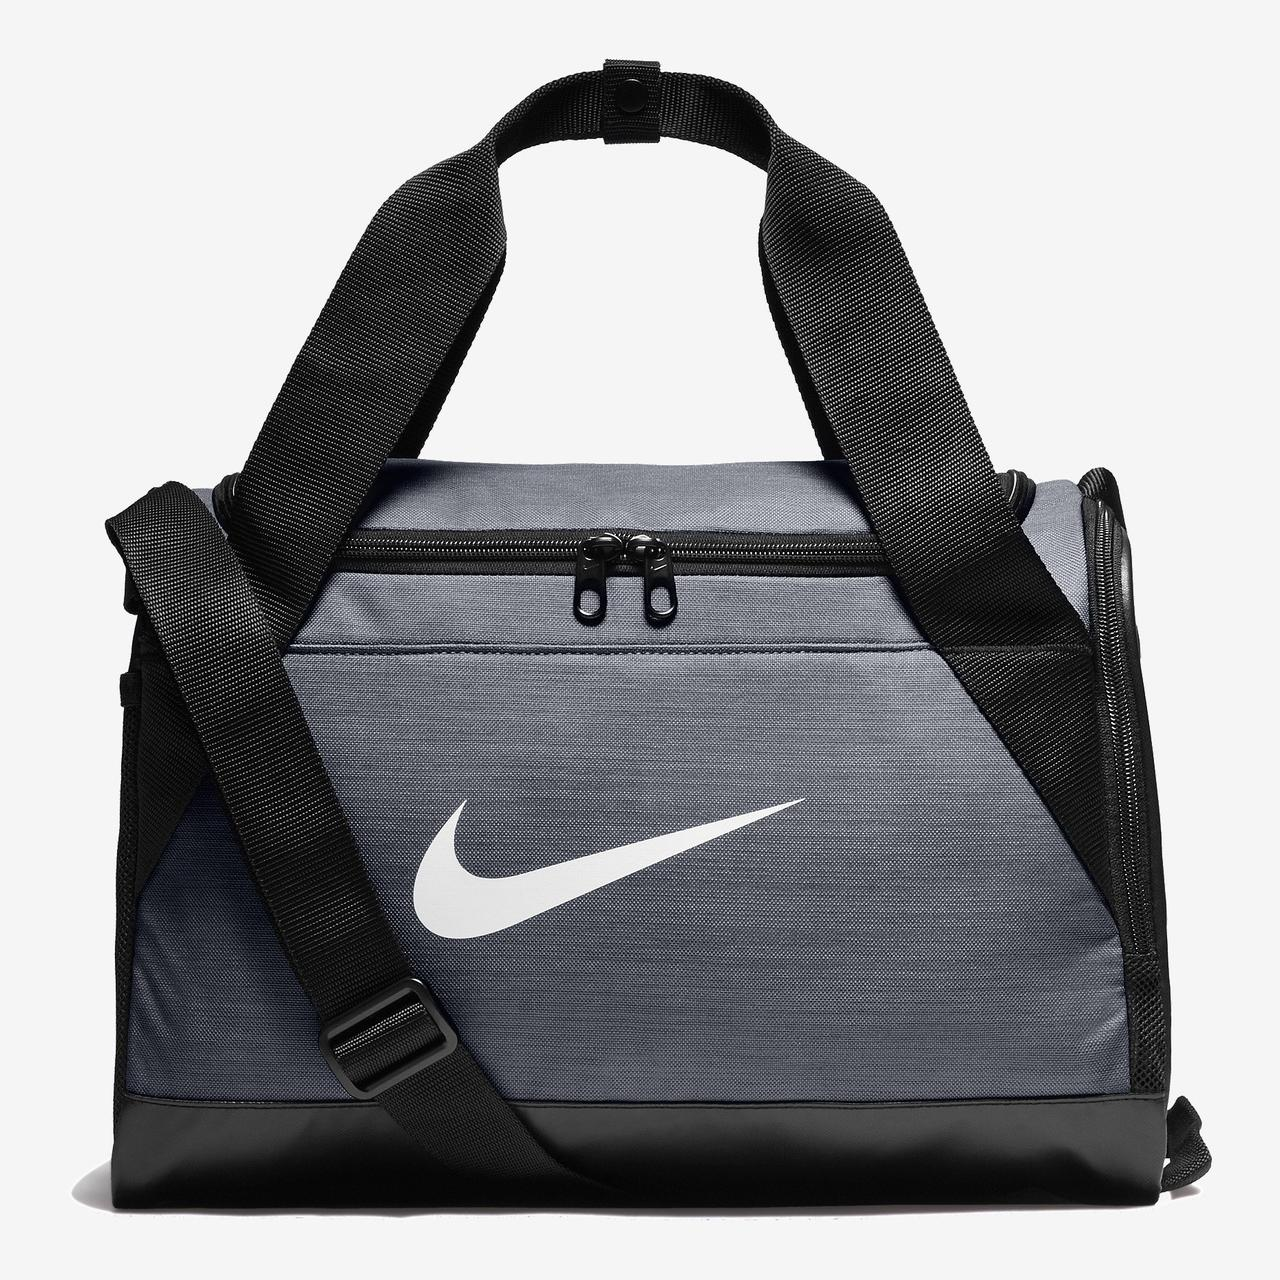 fc575cf5 Спортивная сумка Nike Brazilia Duffel BA5335-064 S 40 л (original)  маленькая мужская